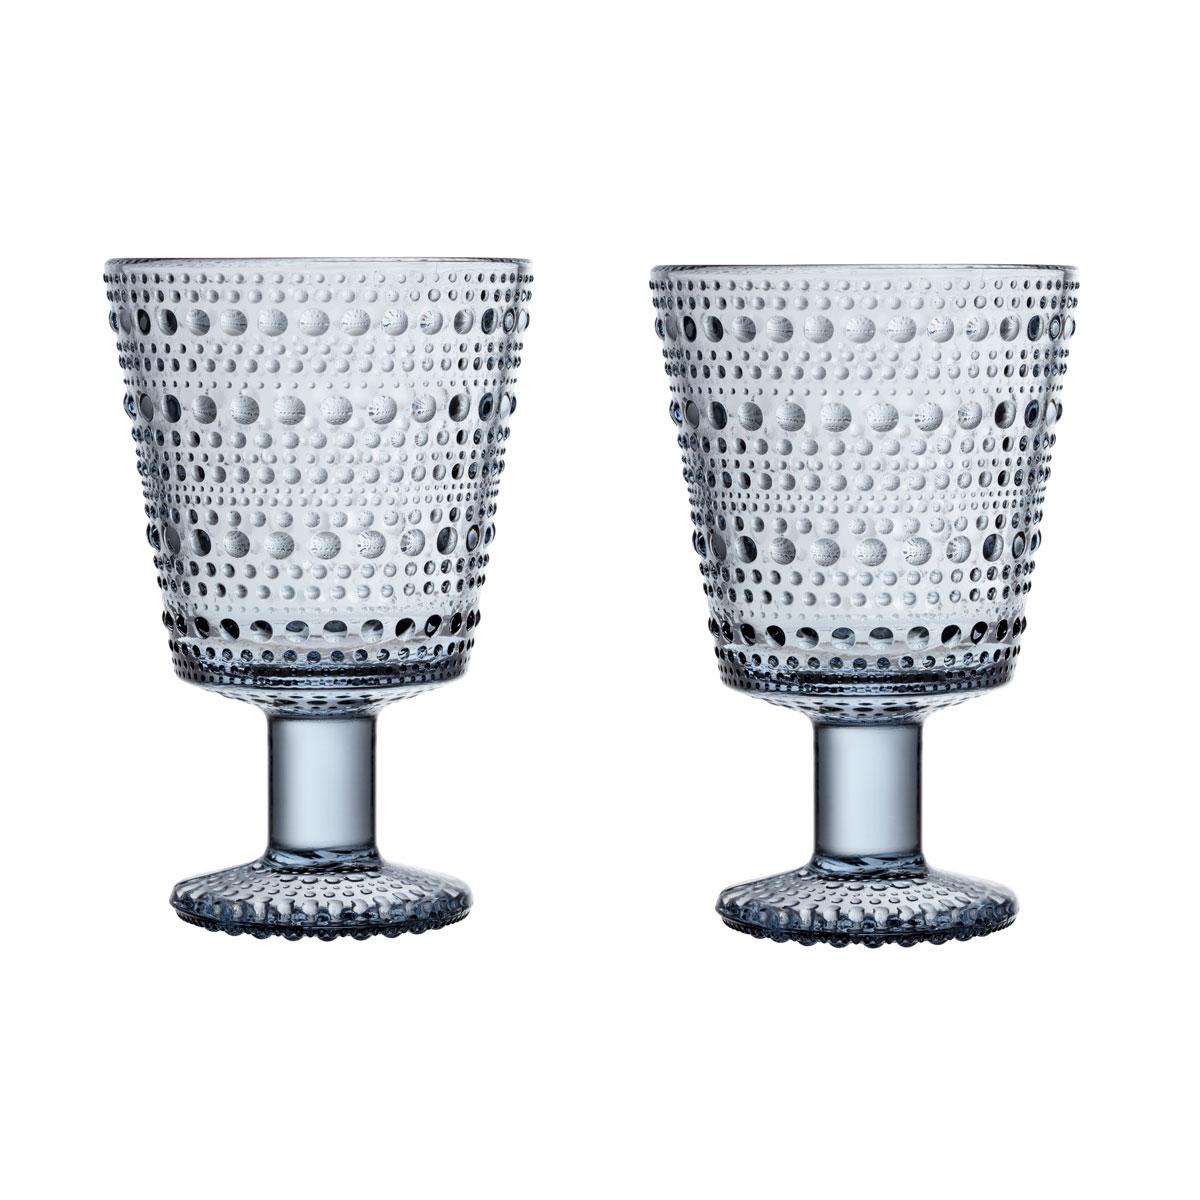 Iittala Kastehelmi Universal Glass 8.75 Oz Pair Recycled Edition